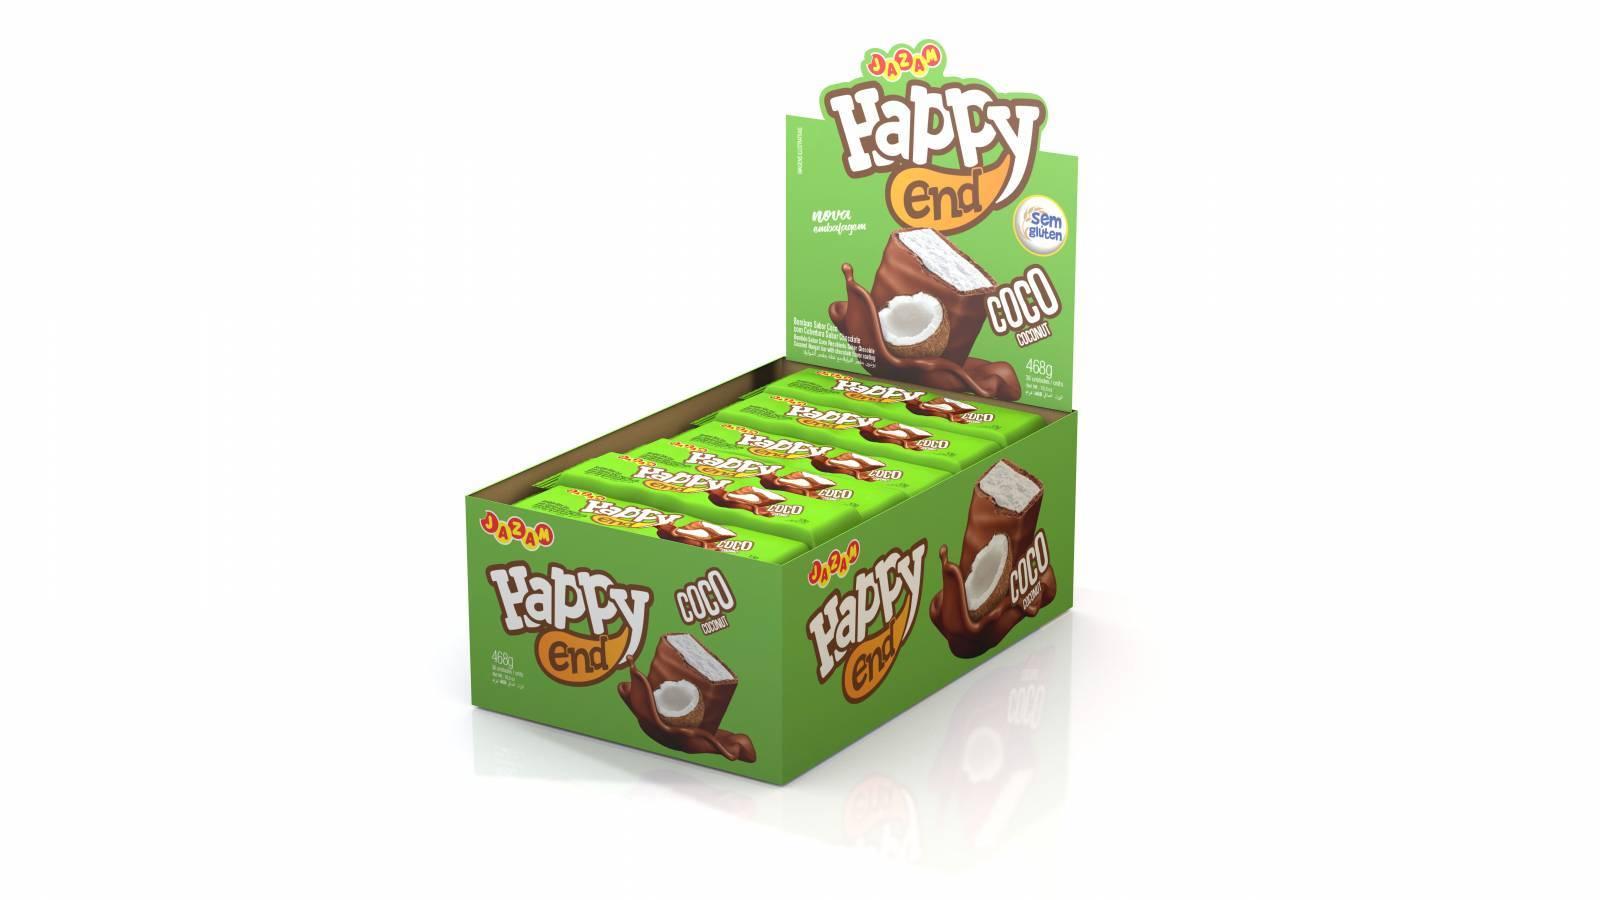 Bombom Happy End Coco - 468g - Jazam Alimentos